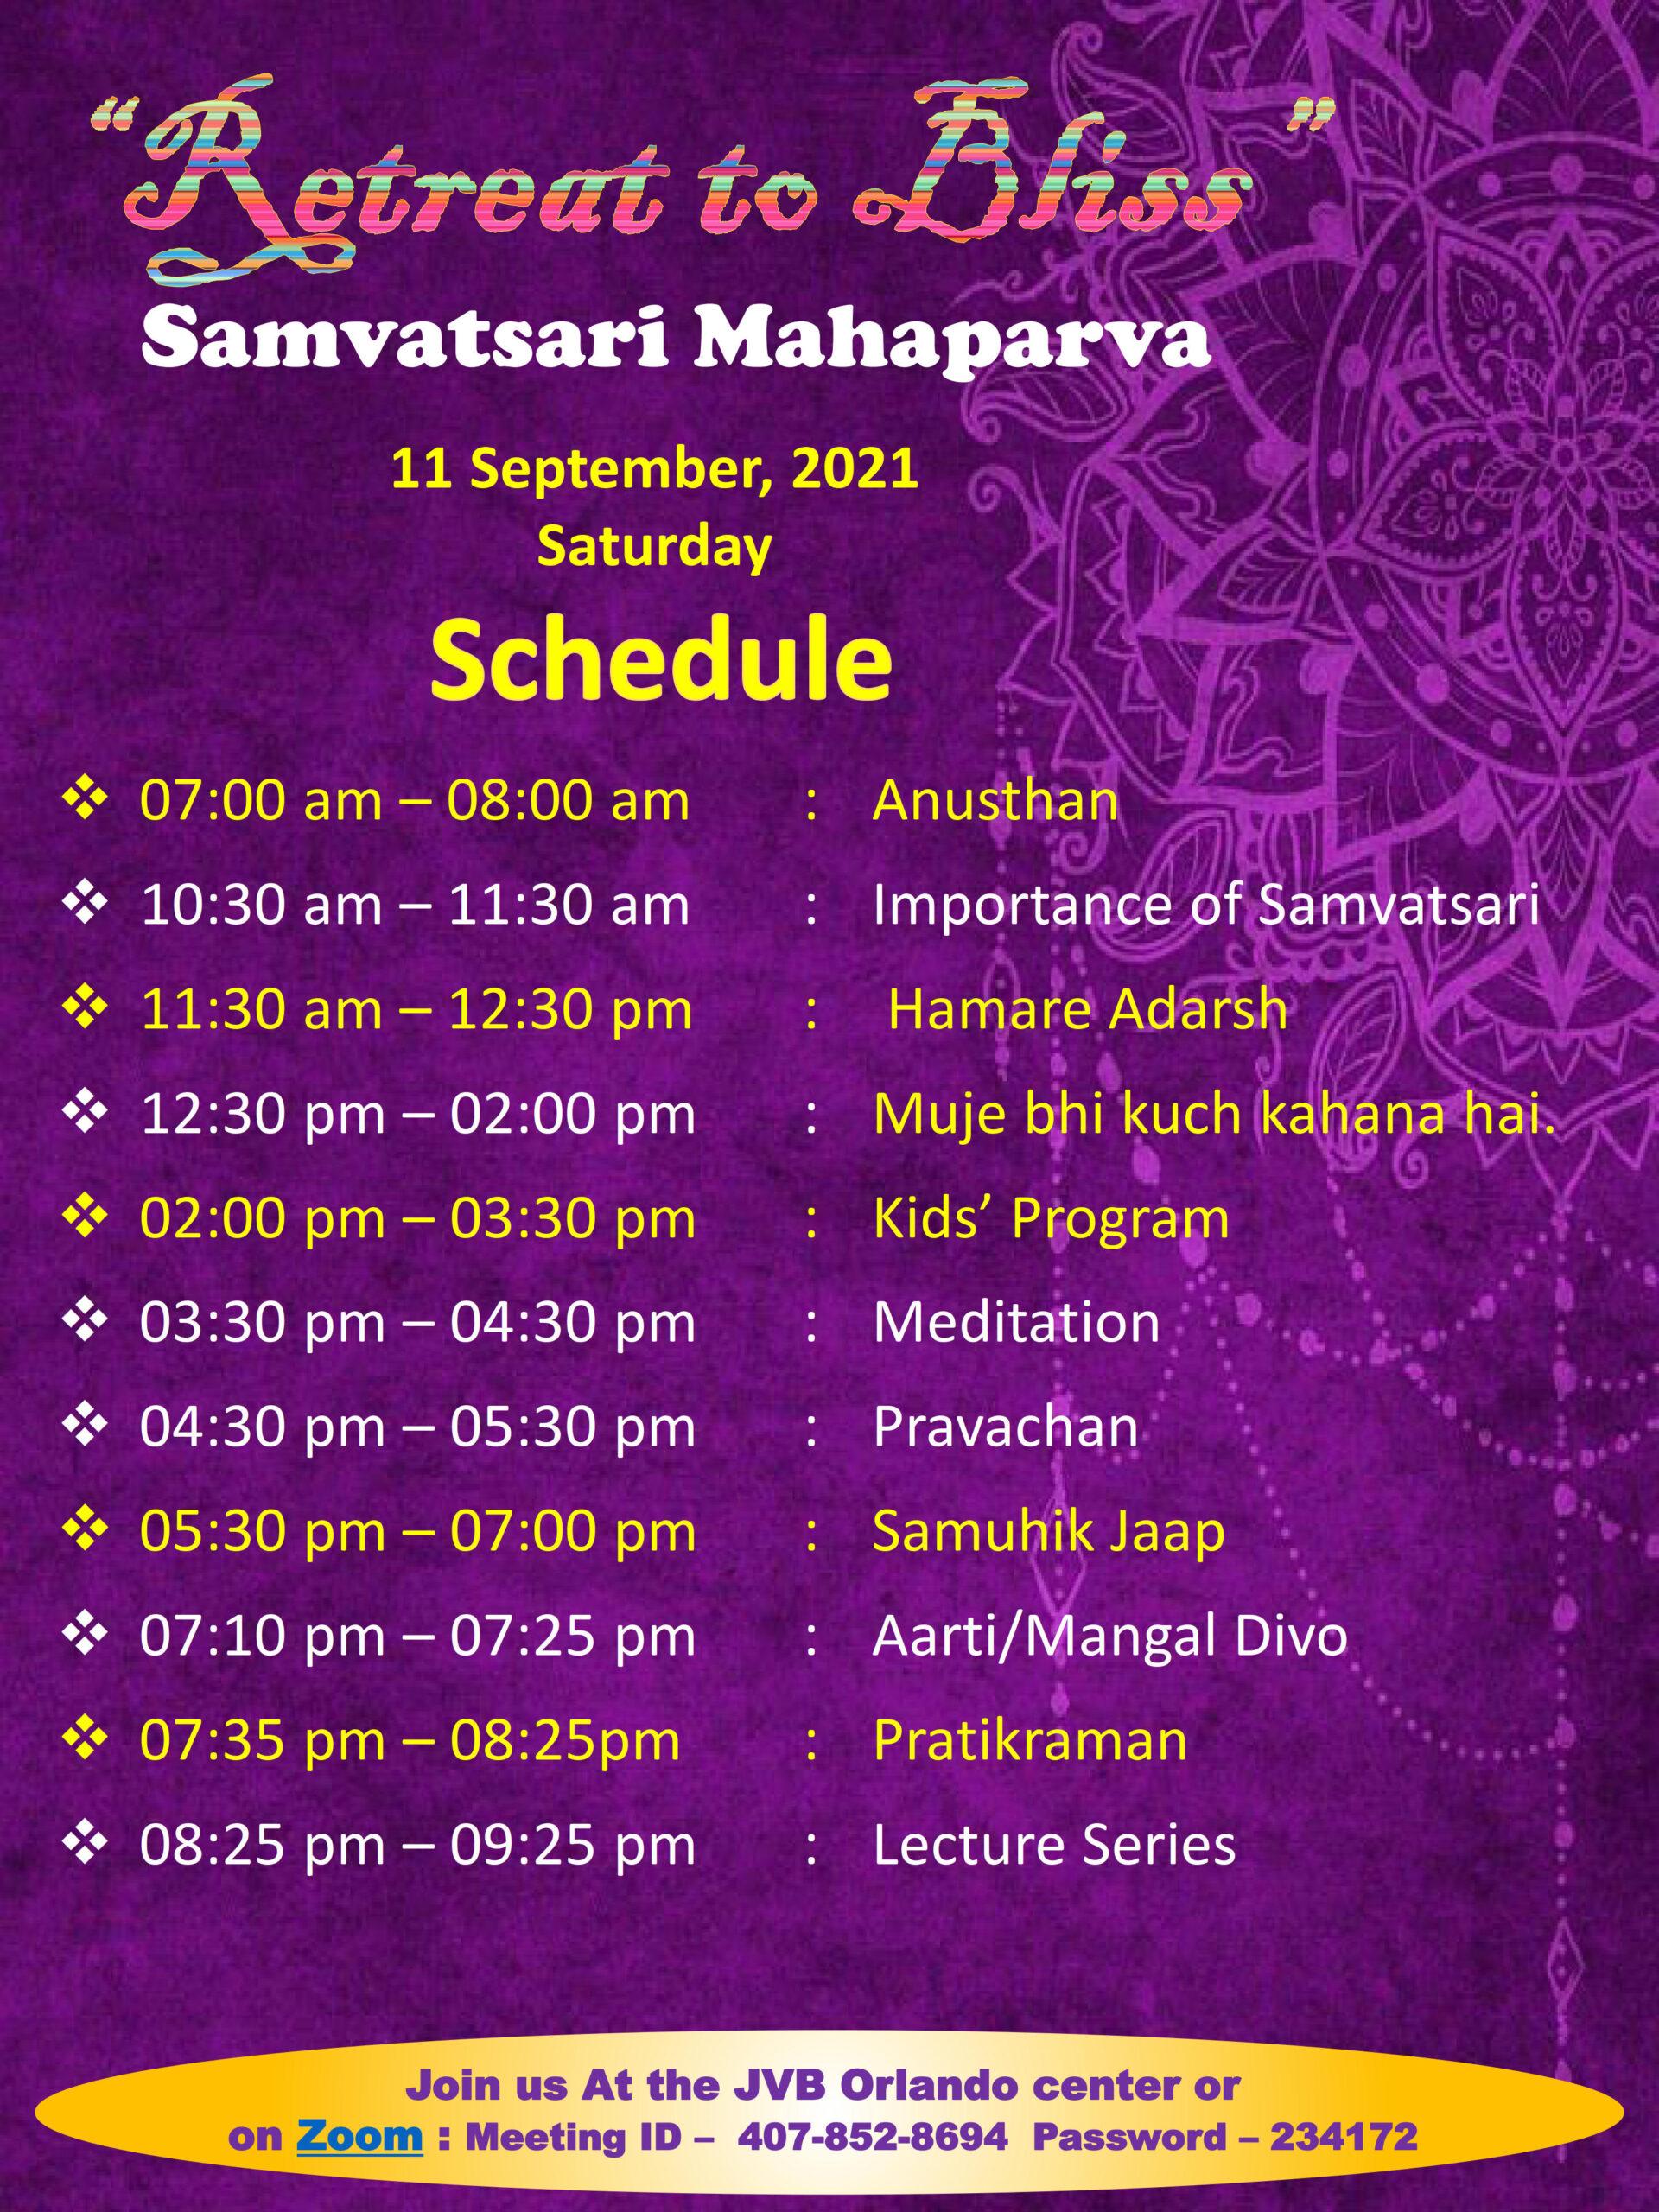 JVB Orlando 2021 Paryushan Mahaparv Samvatsari Schedule Sep 11